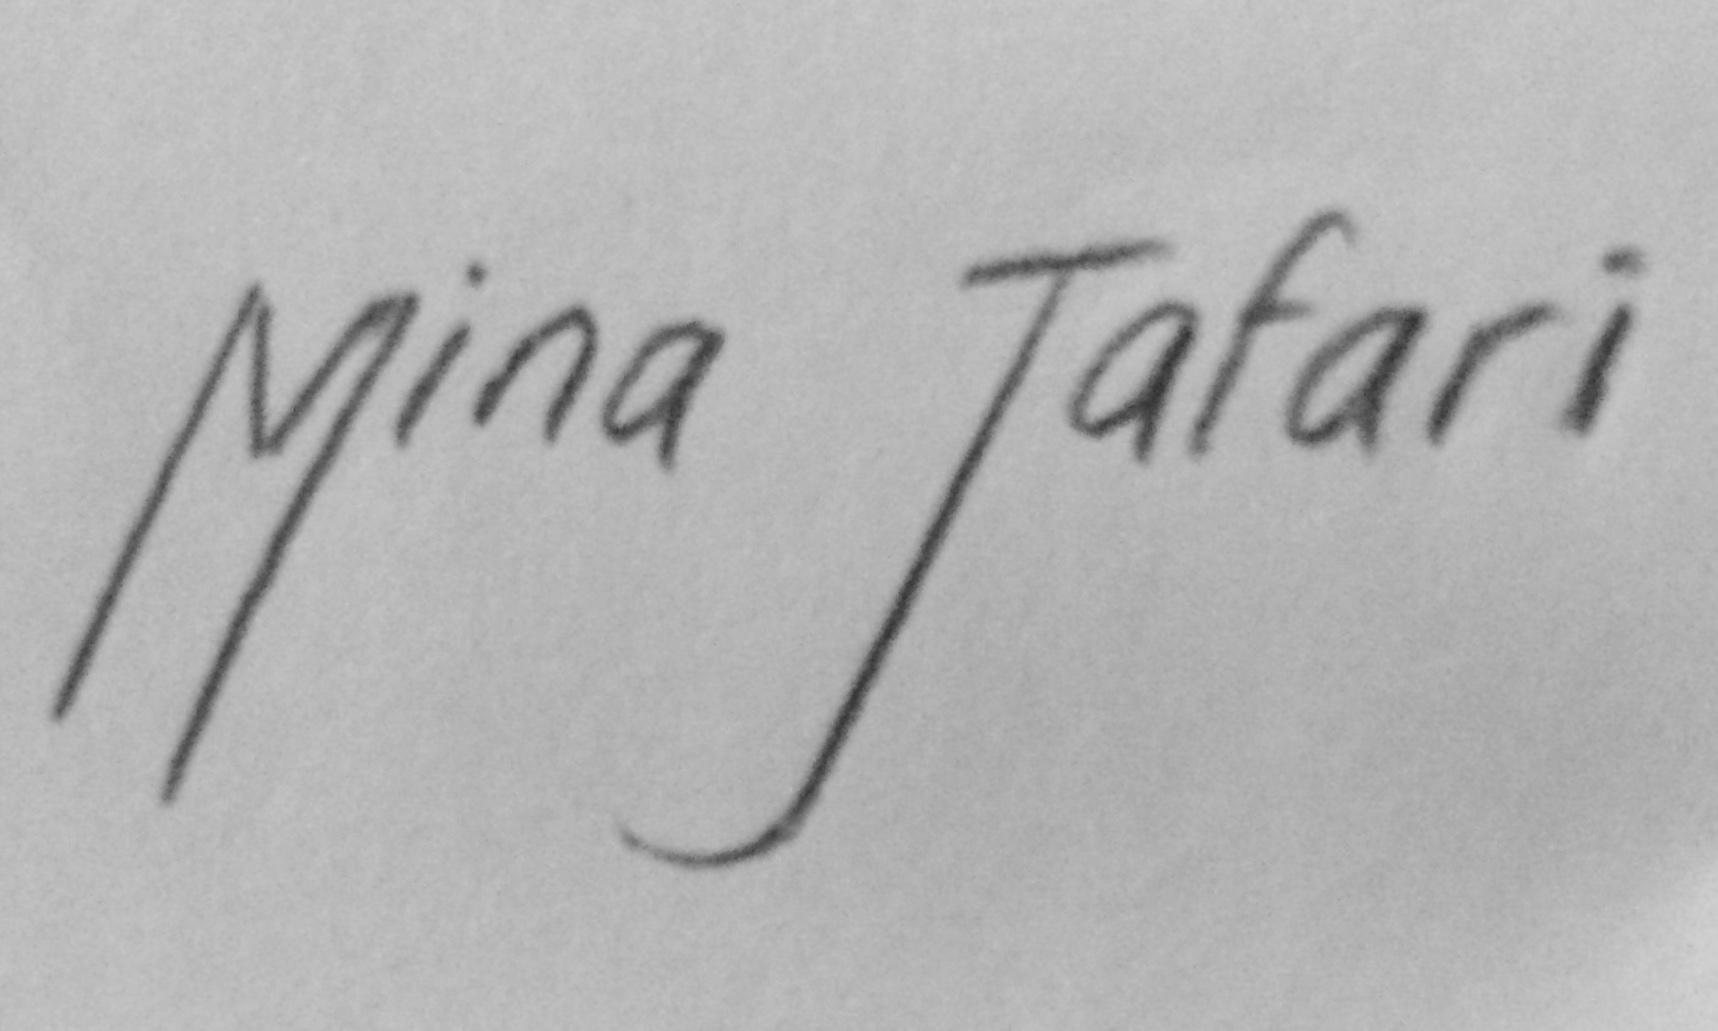 Mina Jafari's Signature